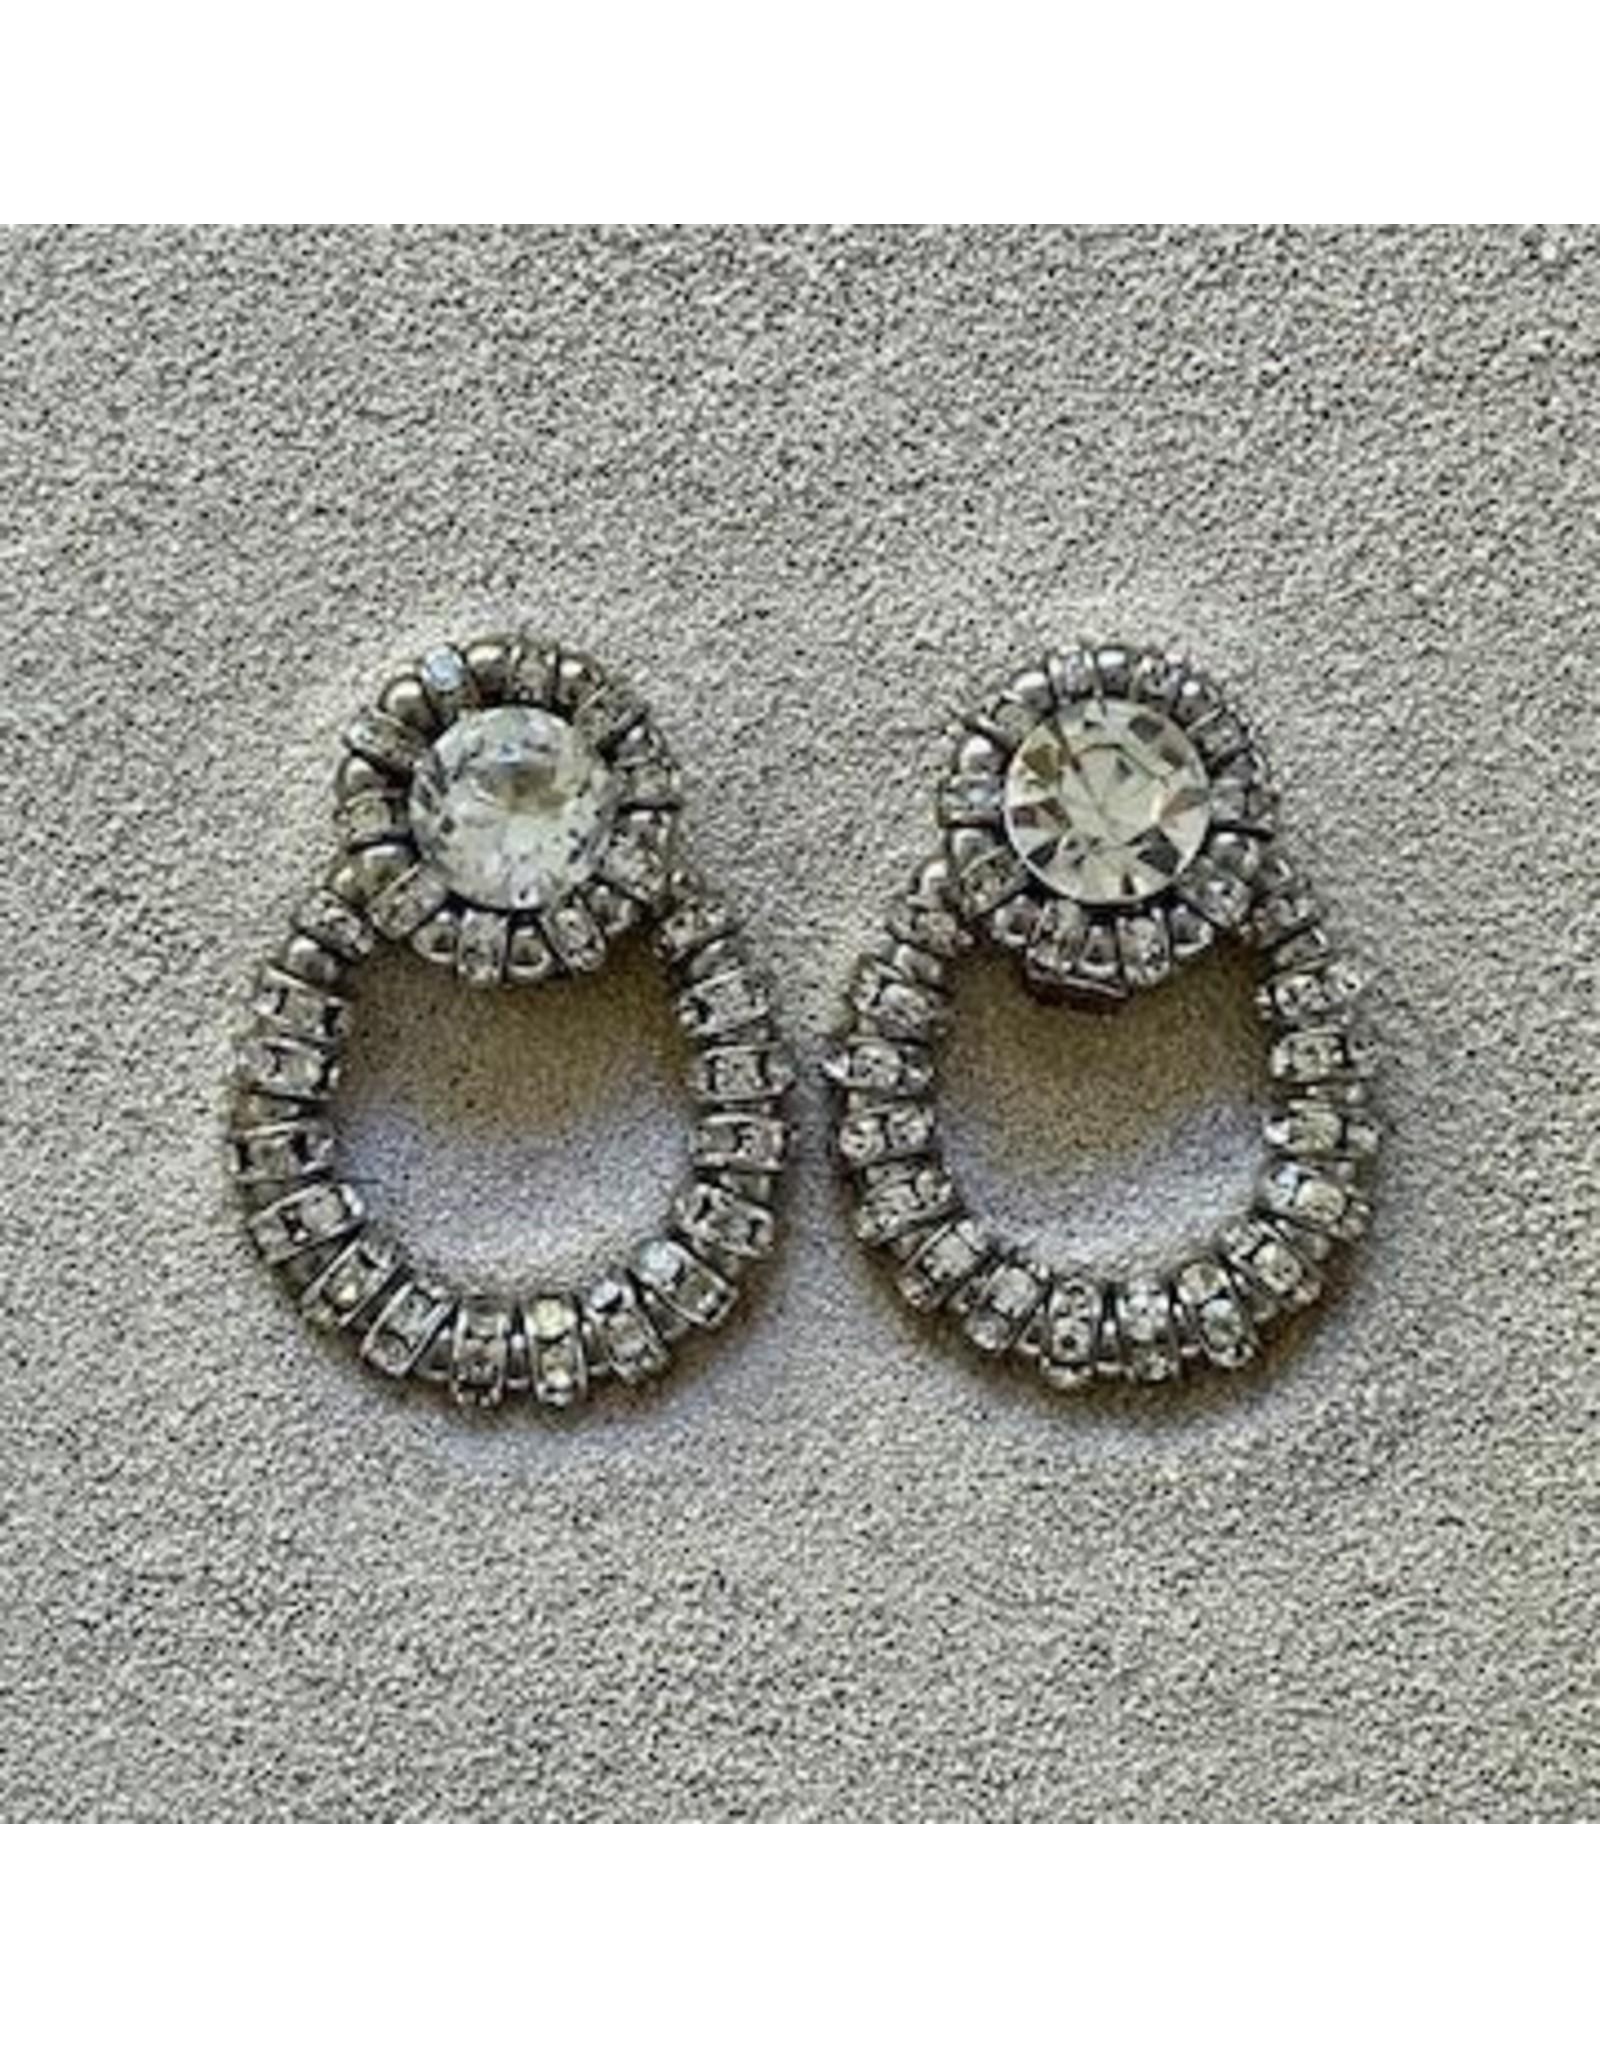 Francoise Montague FMontague: Joyce Loops w/Silver & Crystal Details